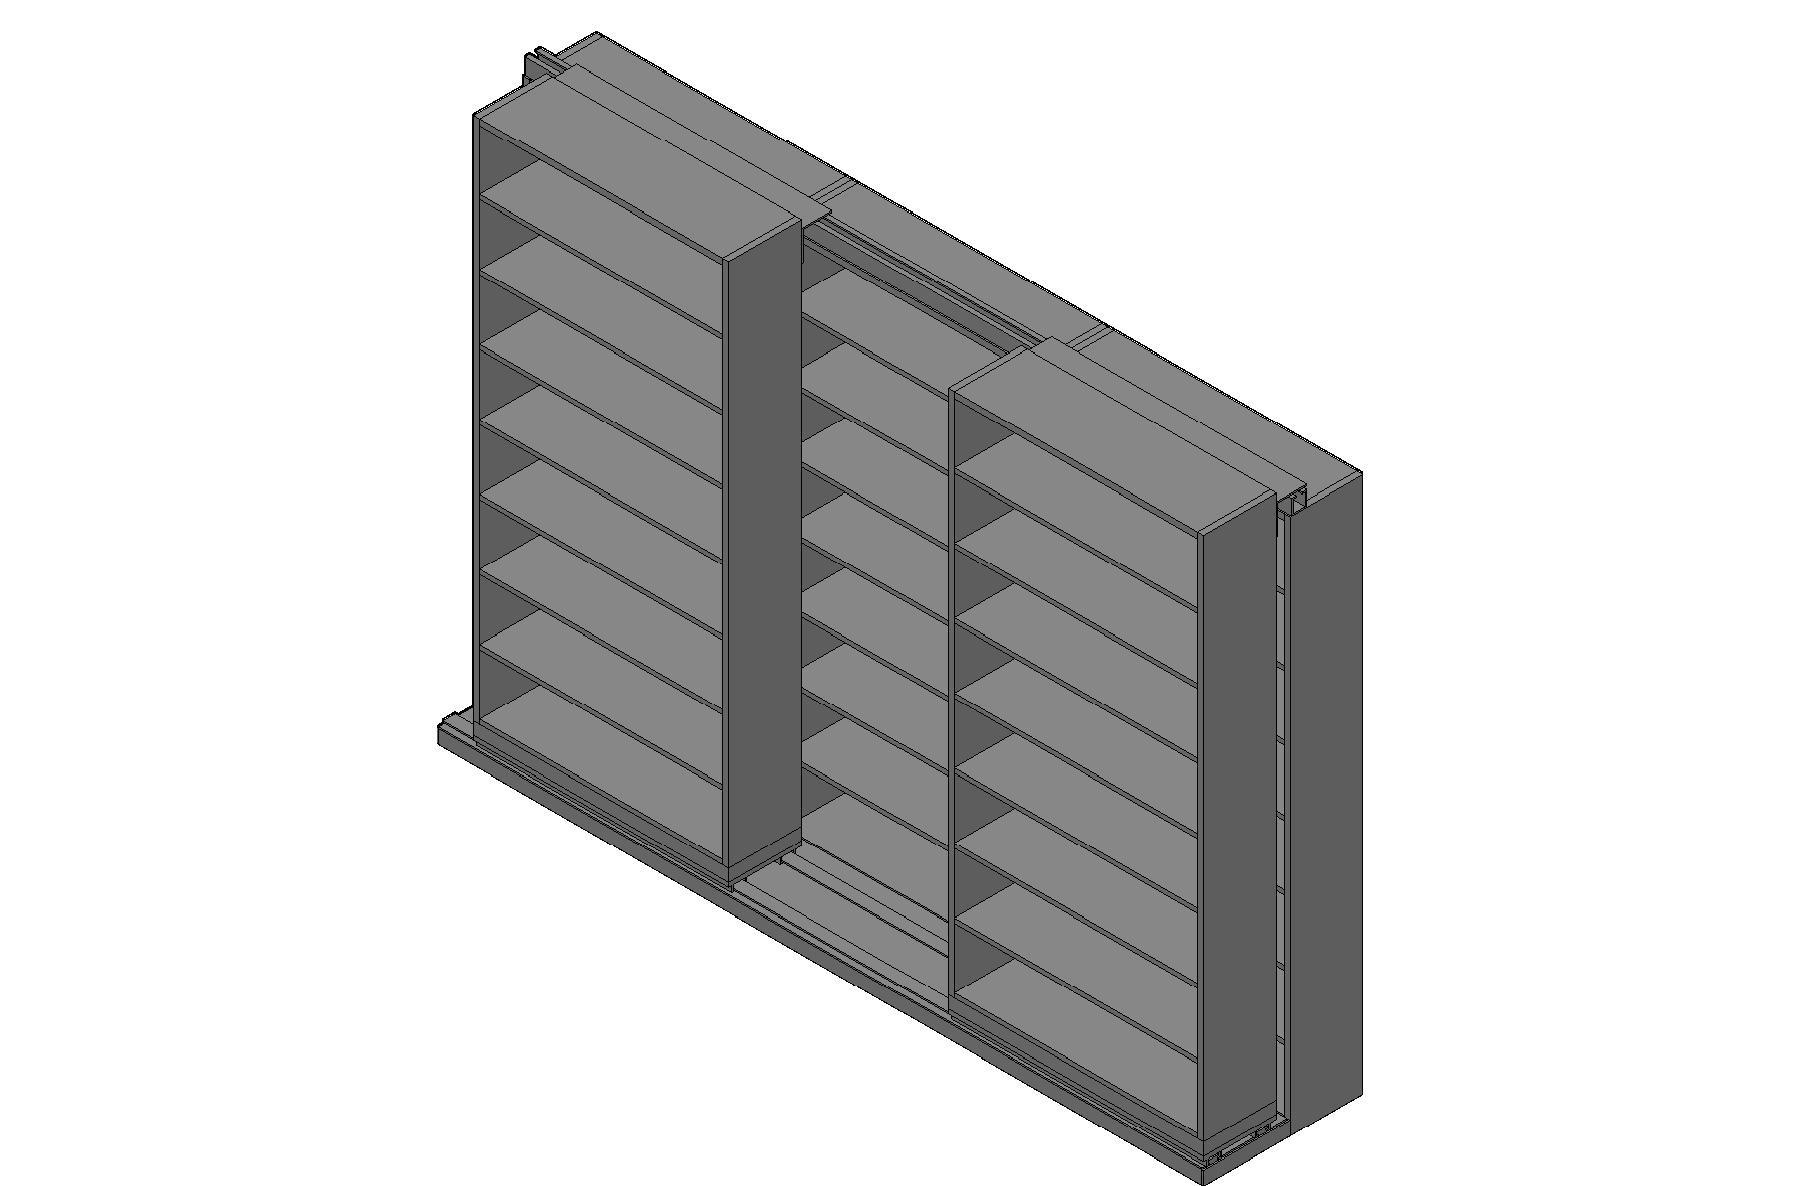 "Letter Size Sliding Shelves - 2 Rows Deep - 8 Levels - (42"" x 12"" Shelves) - 130"" Total Width"